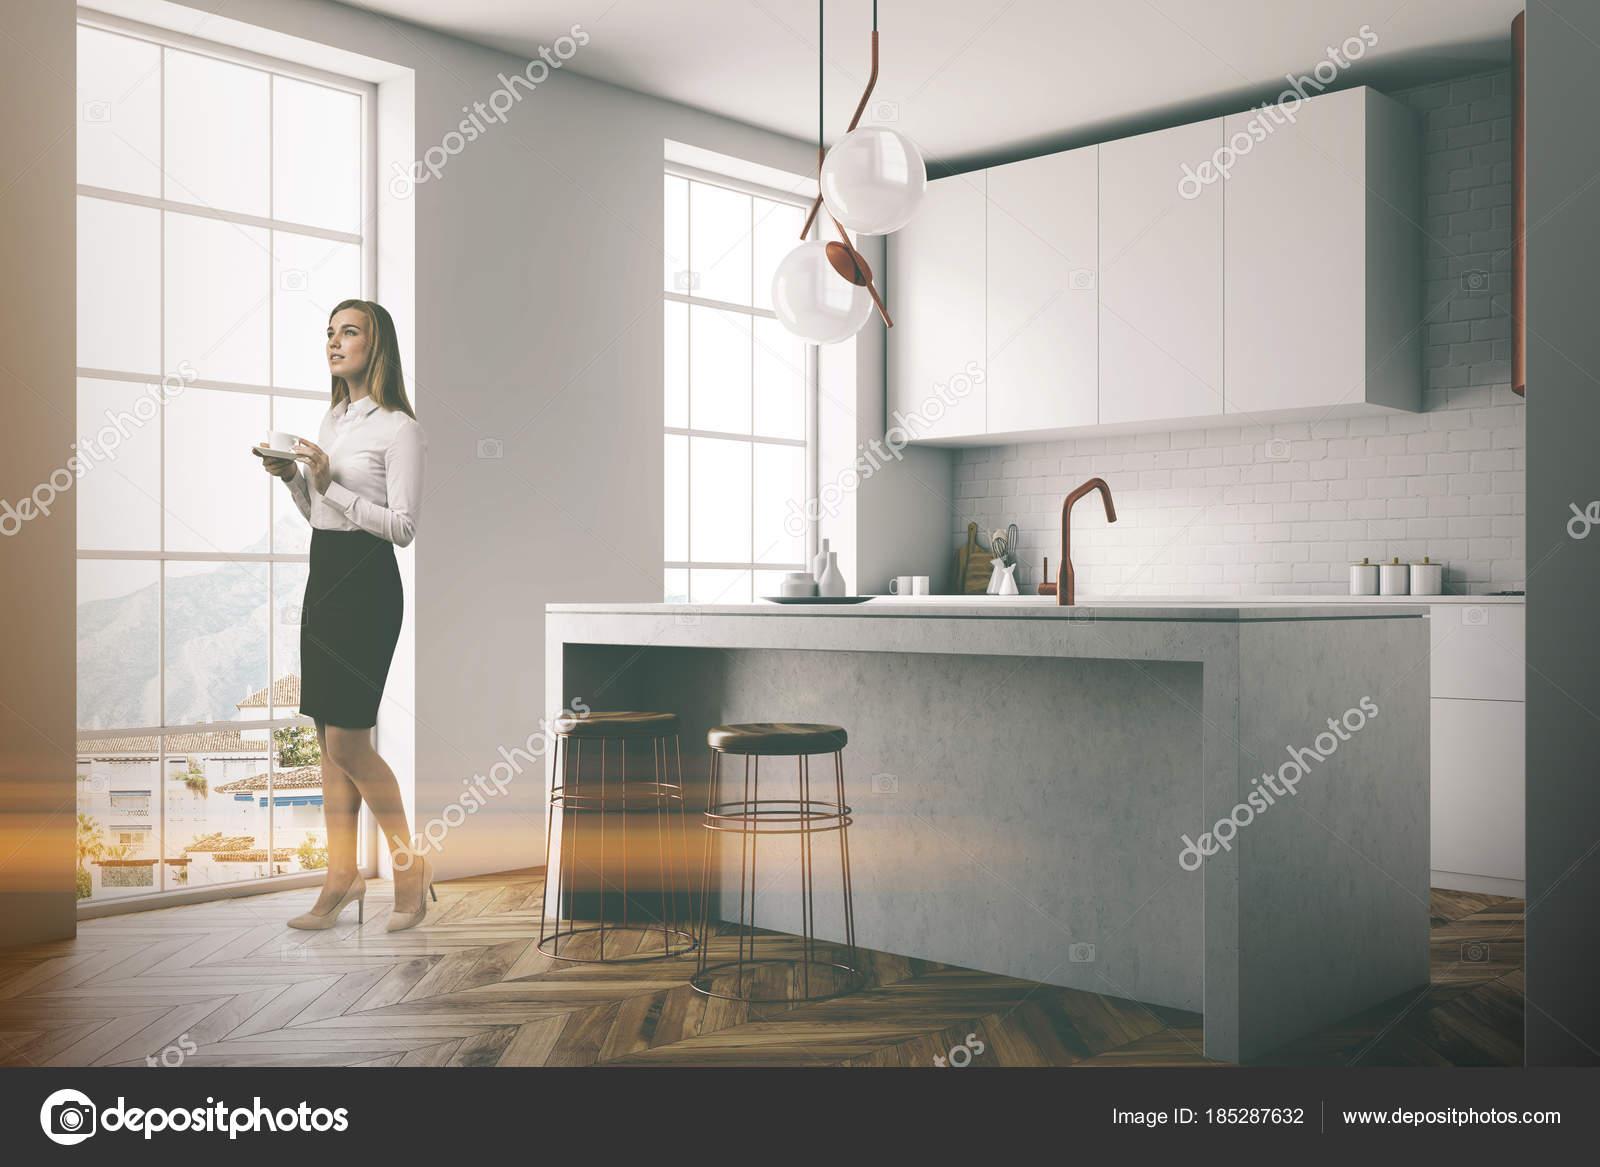 kitchen corner sinks aid attachments 灰色墙壁厨房角落 黑色台面 图库照片 c denisismagilov 185287632 灰色墙壁厨房角落与黑和灰色台面 水槽和空白墙壁片断 一个女商人 3d 渲染模拟色调图像 照片作者denisismagilov